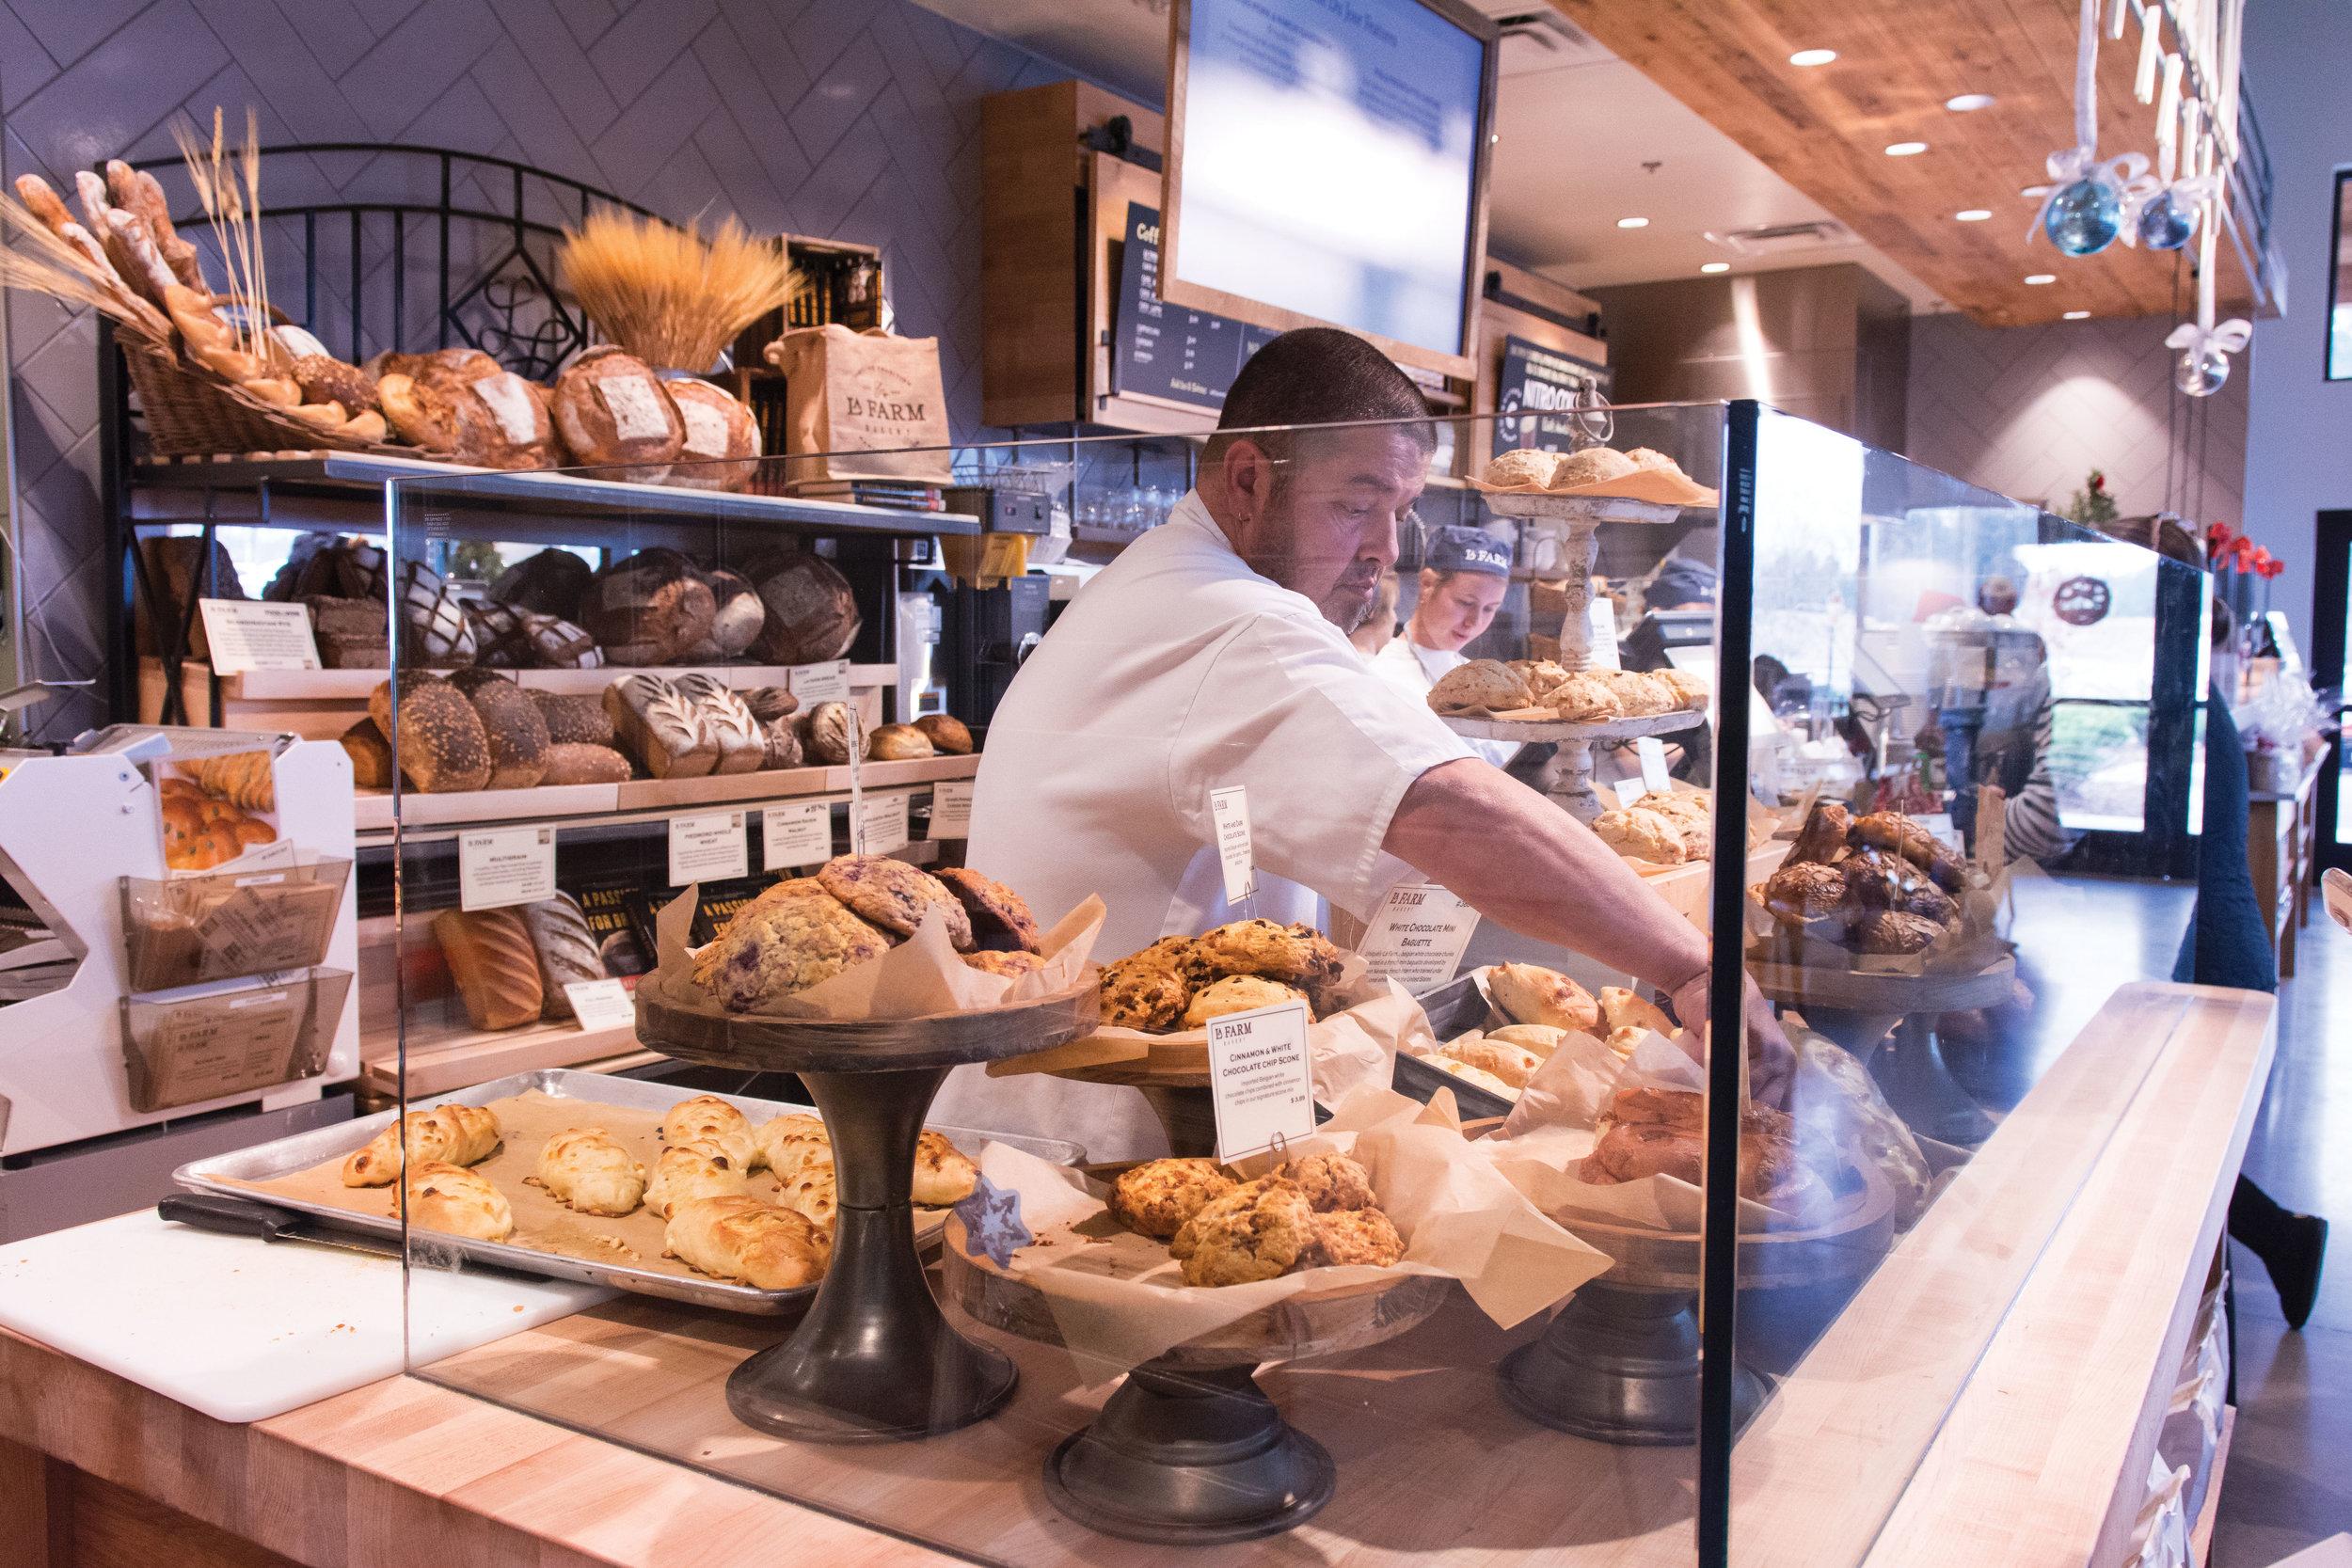 best bread bakery la farm bakery  photo by ginny williams photography